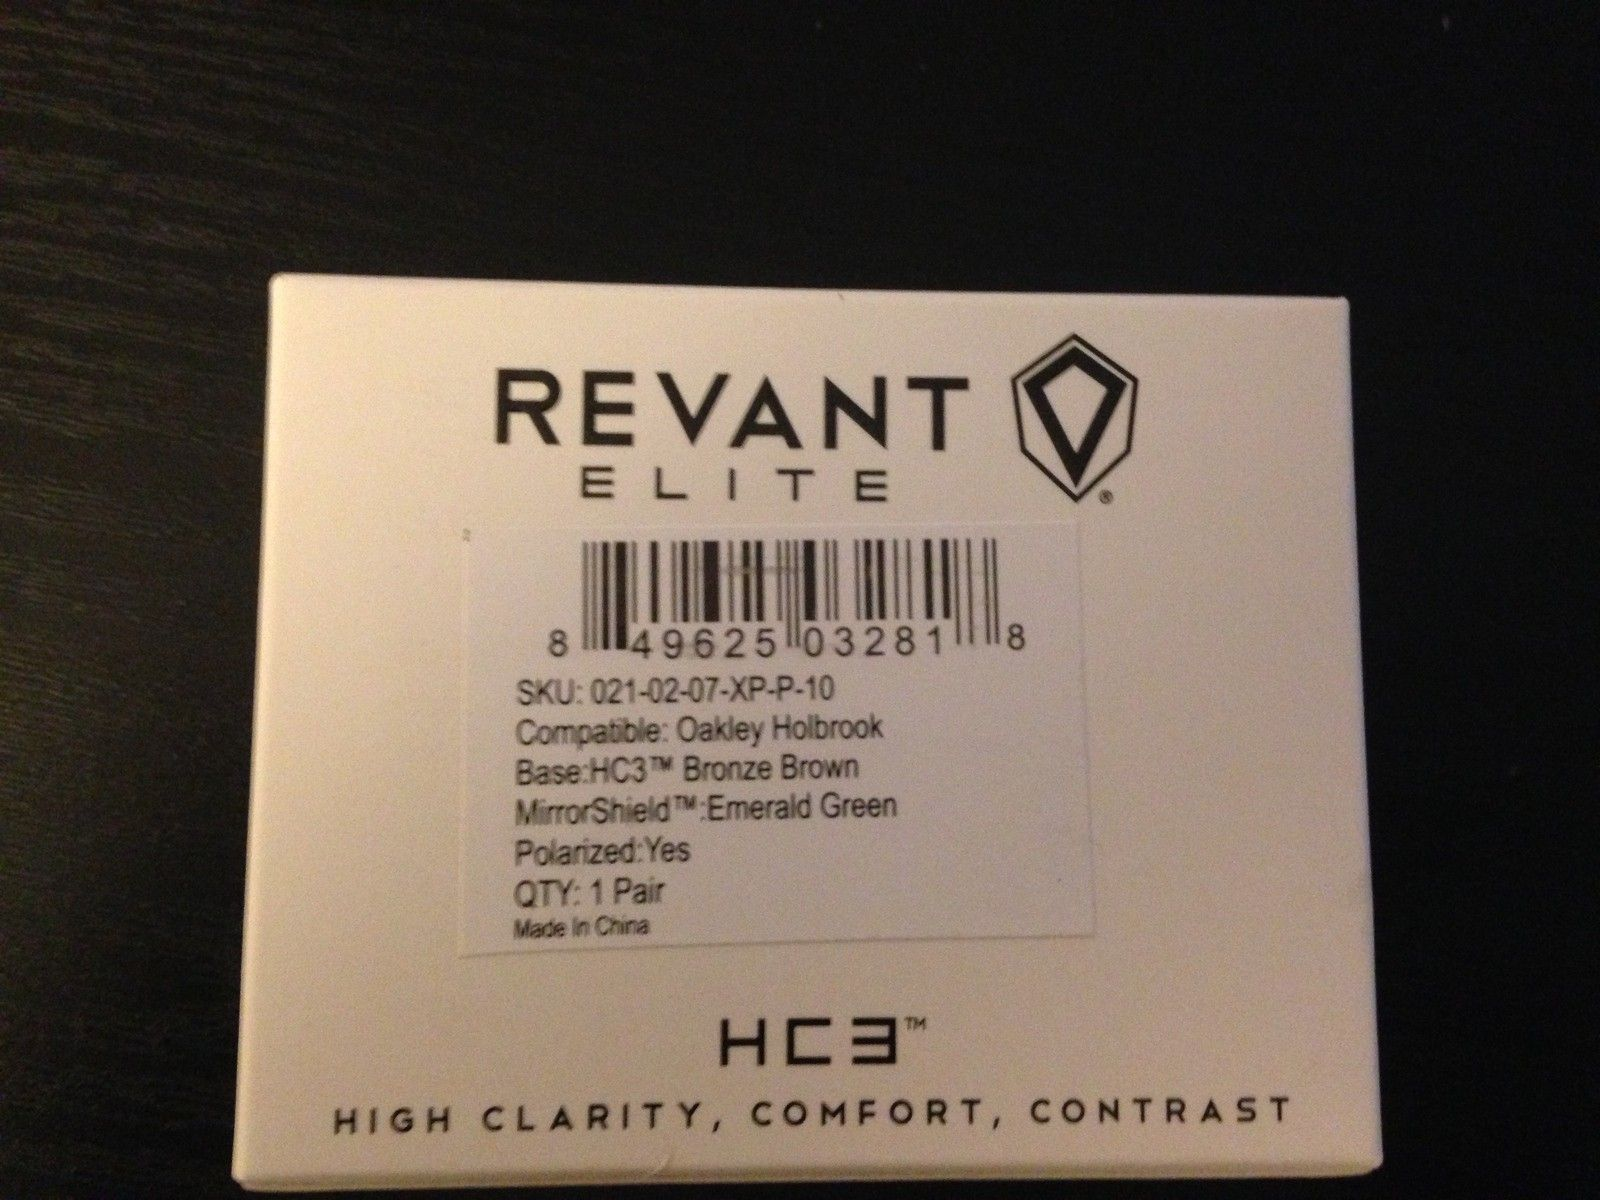 Revant Optics HC3 Elite Mirrorshield Lens Review - IMG_1730.jpg